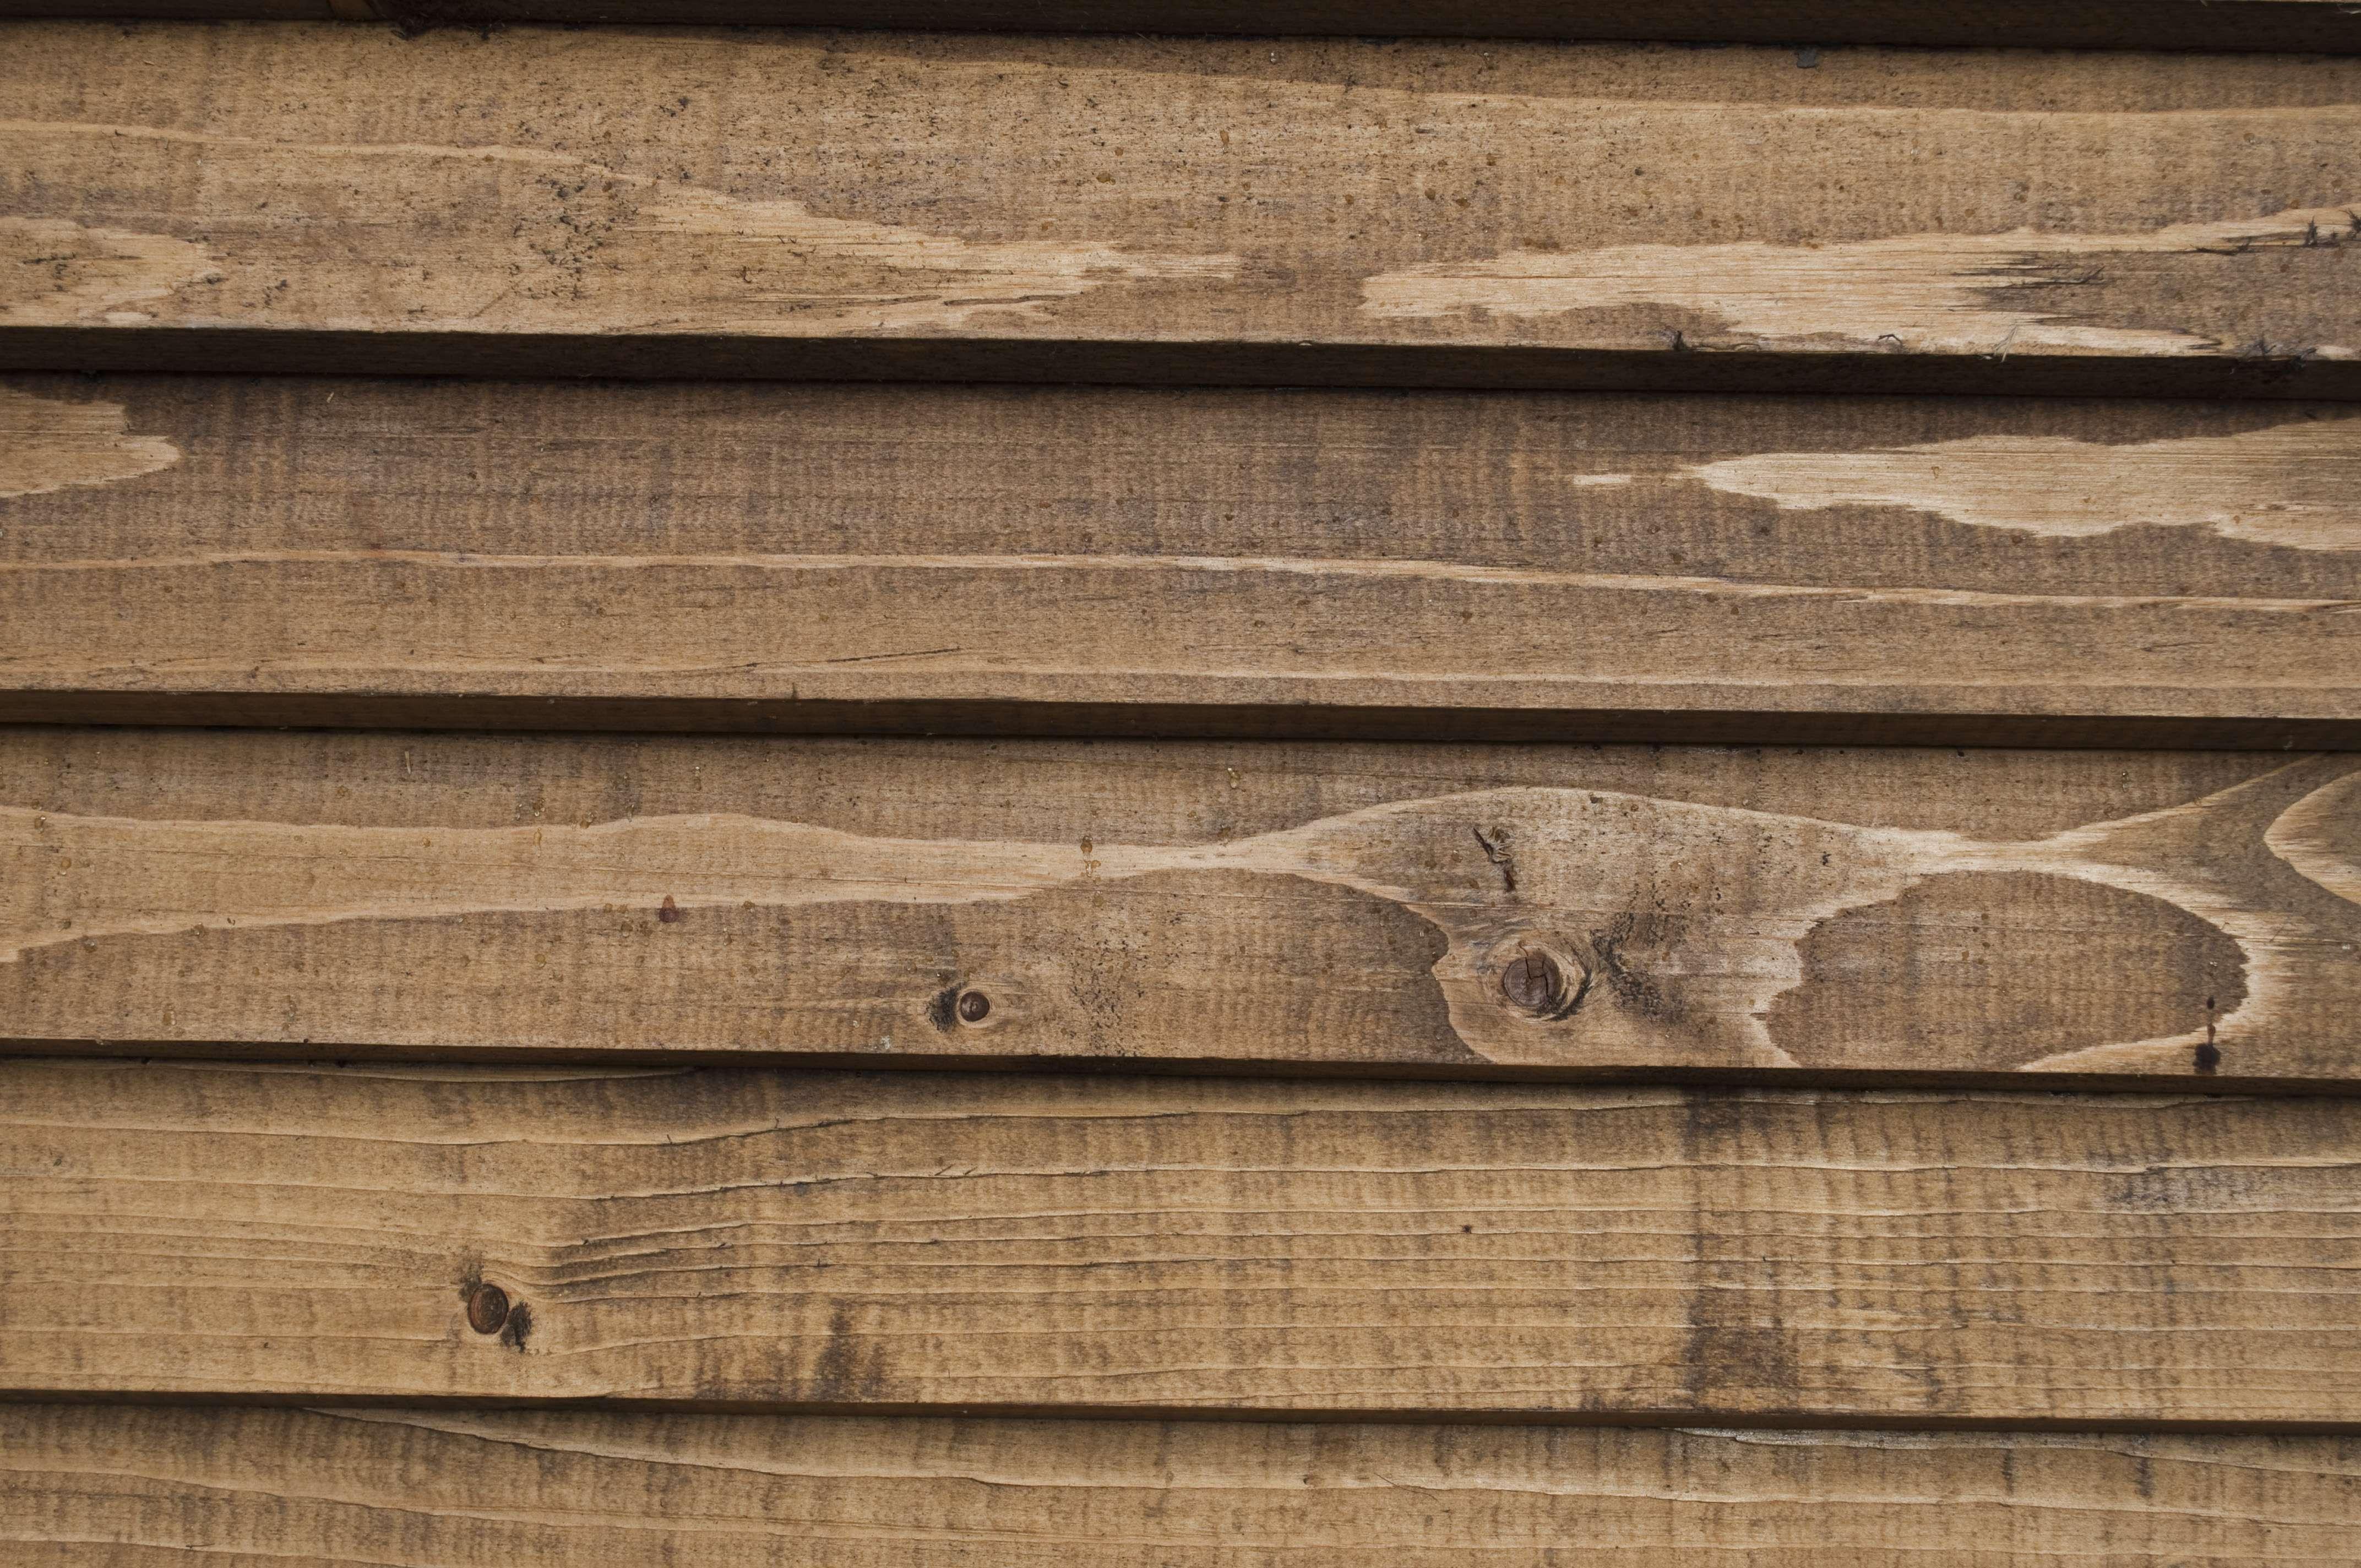 Textura madera vieja imagui for Fotos en madera